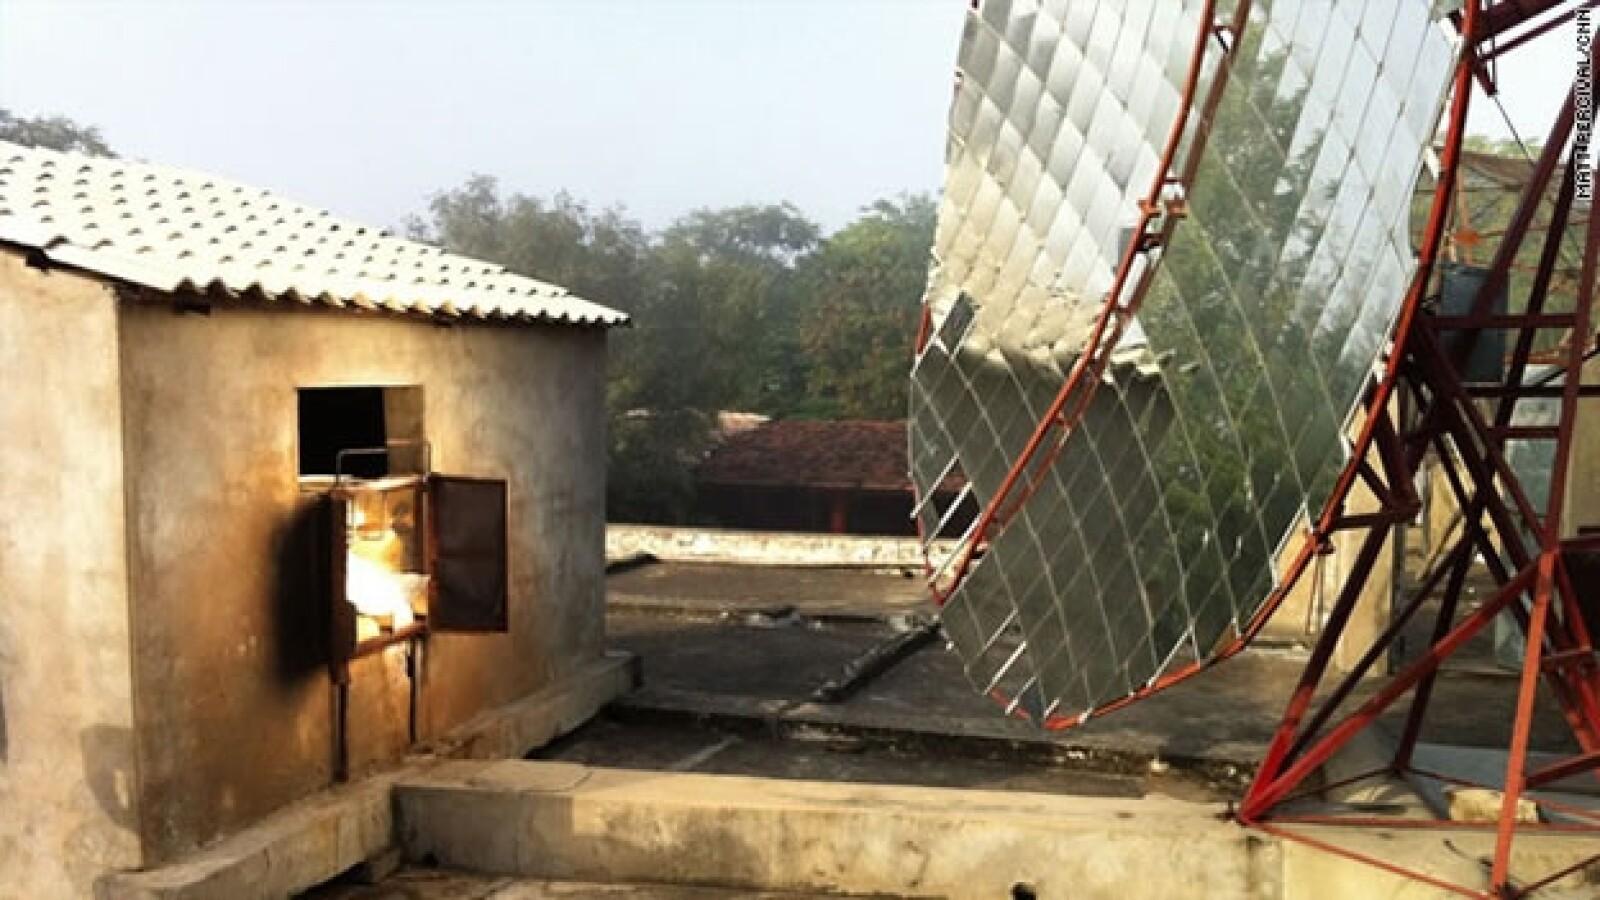 mujeres rurales solares 03